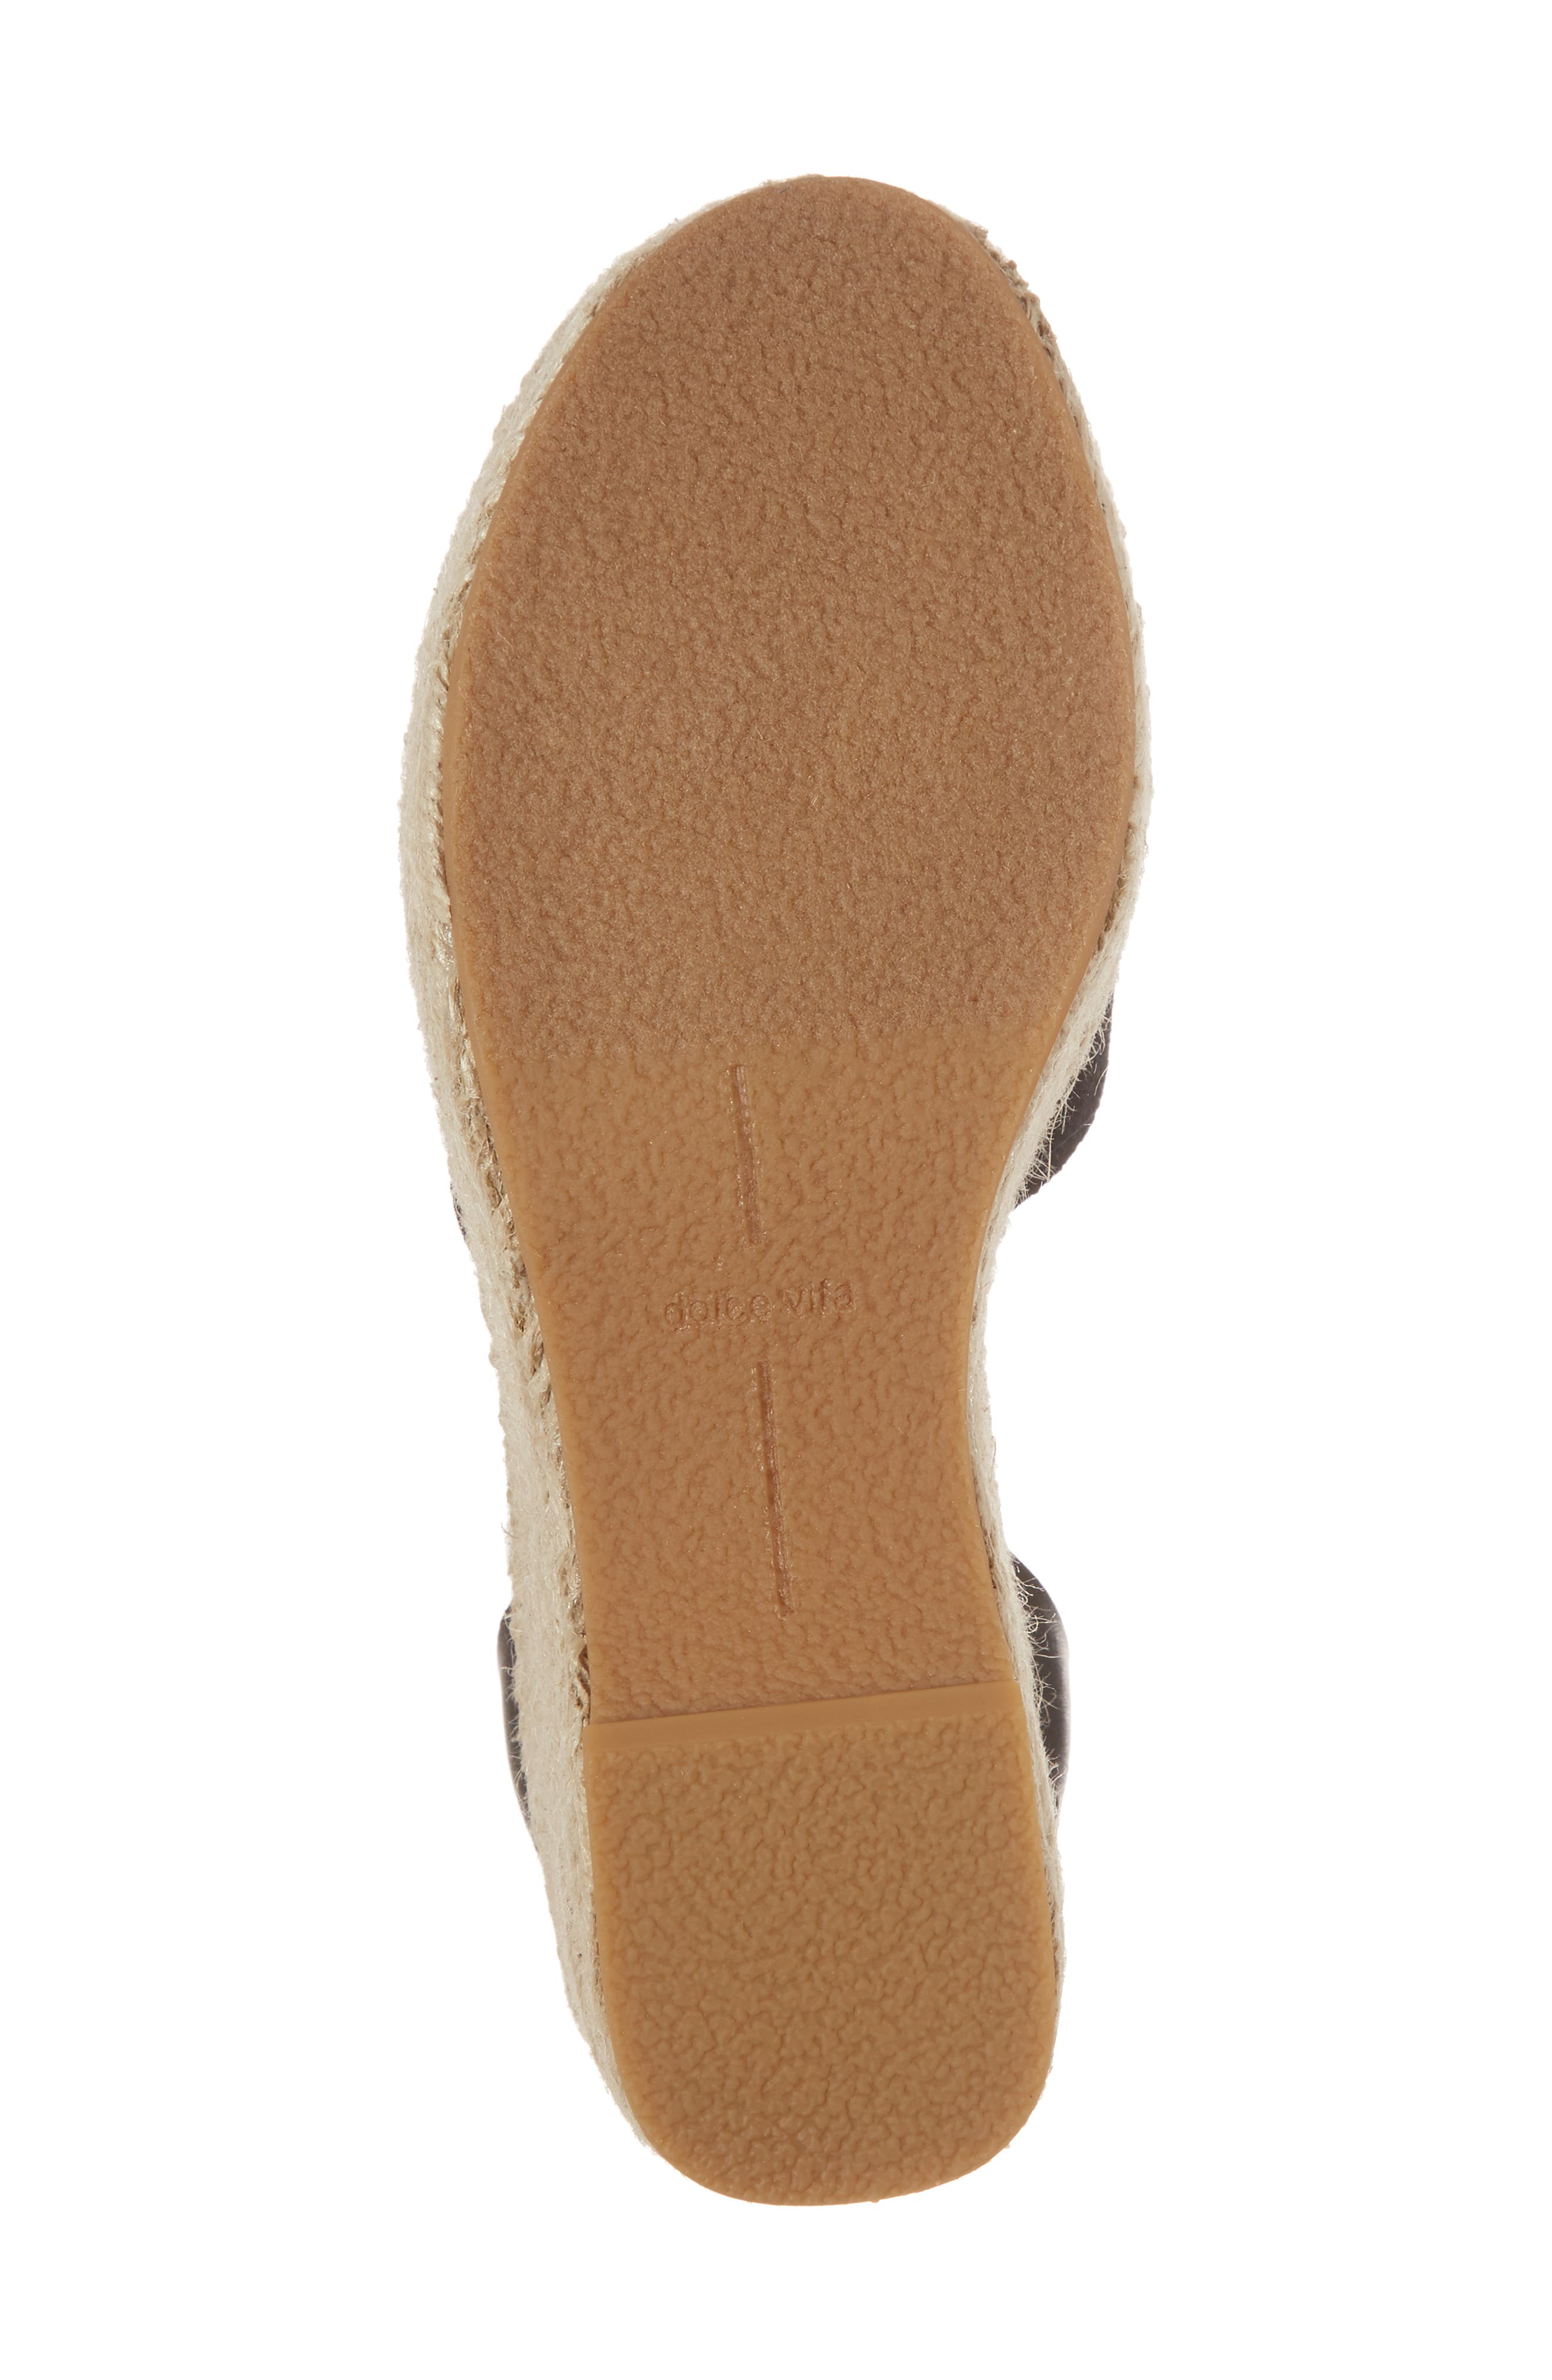 Lesly Espadrille Platform Sandal,                             Alternate thumbnail 36, color,